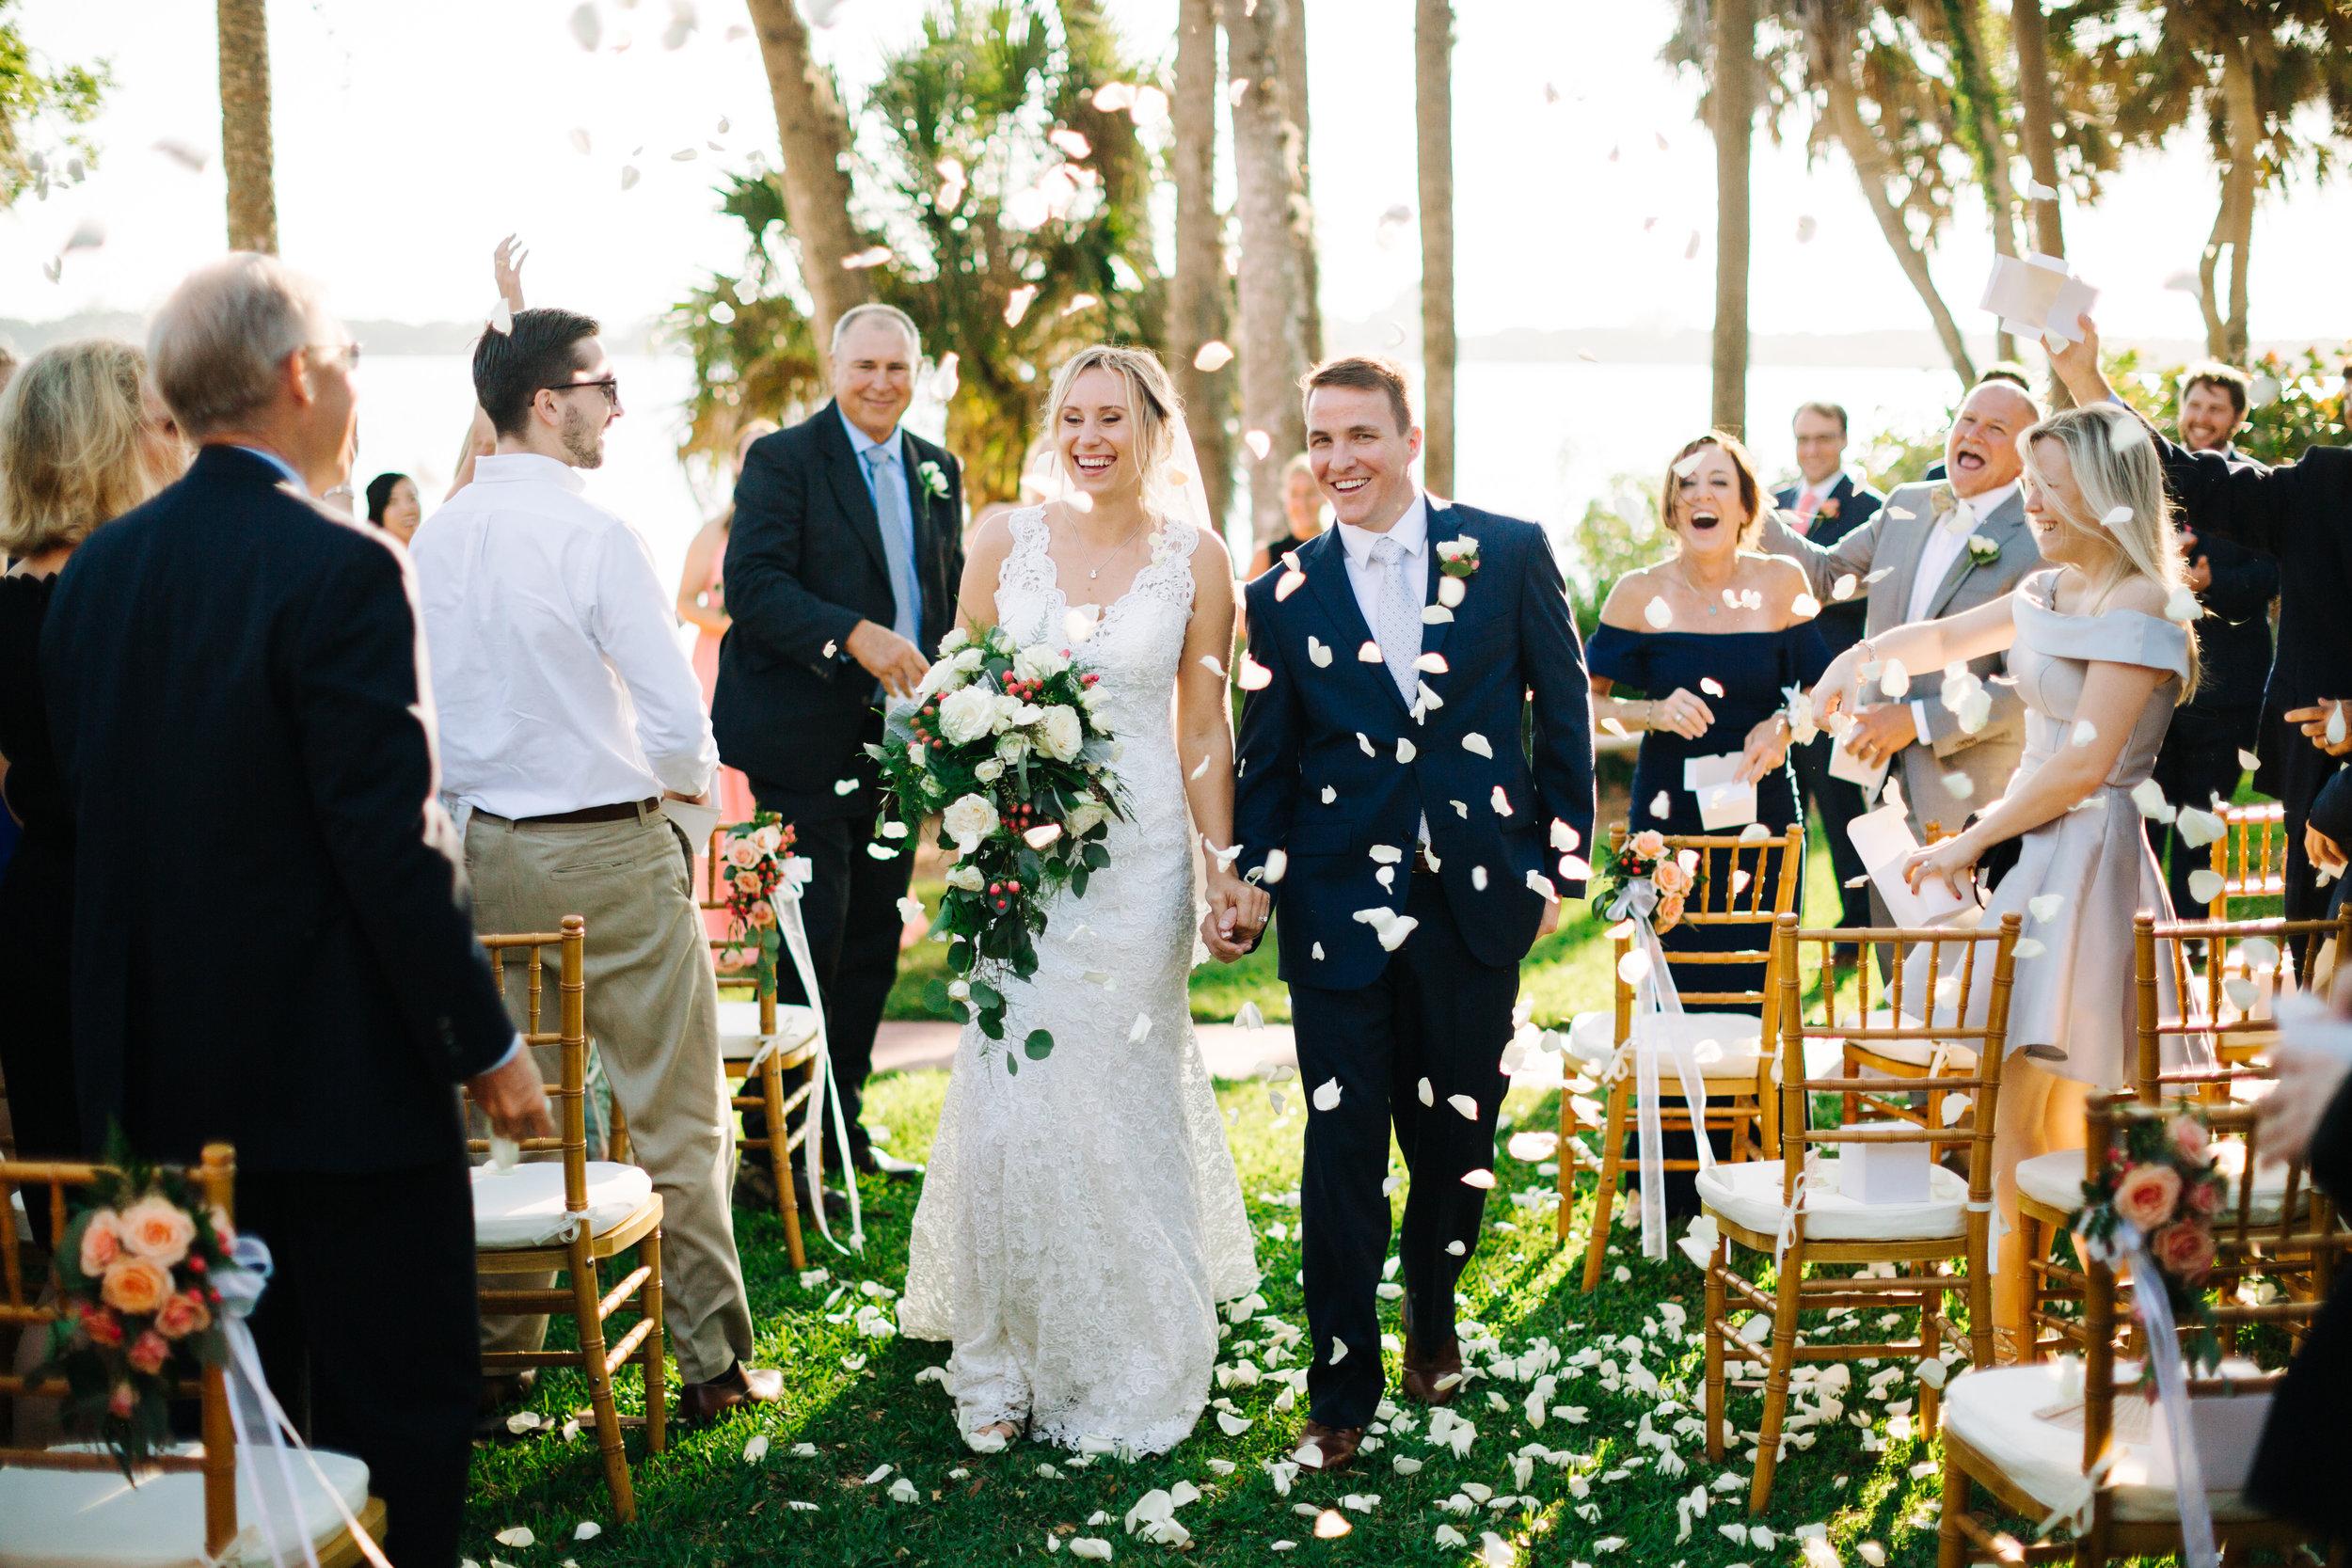 Will & Ciara - Ceremony - Jake & Katie Photography_168.jpg